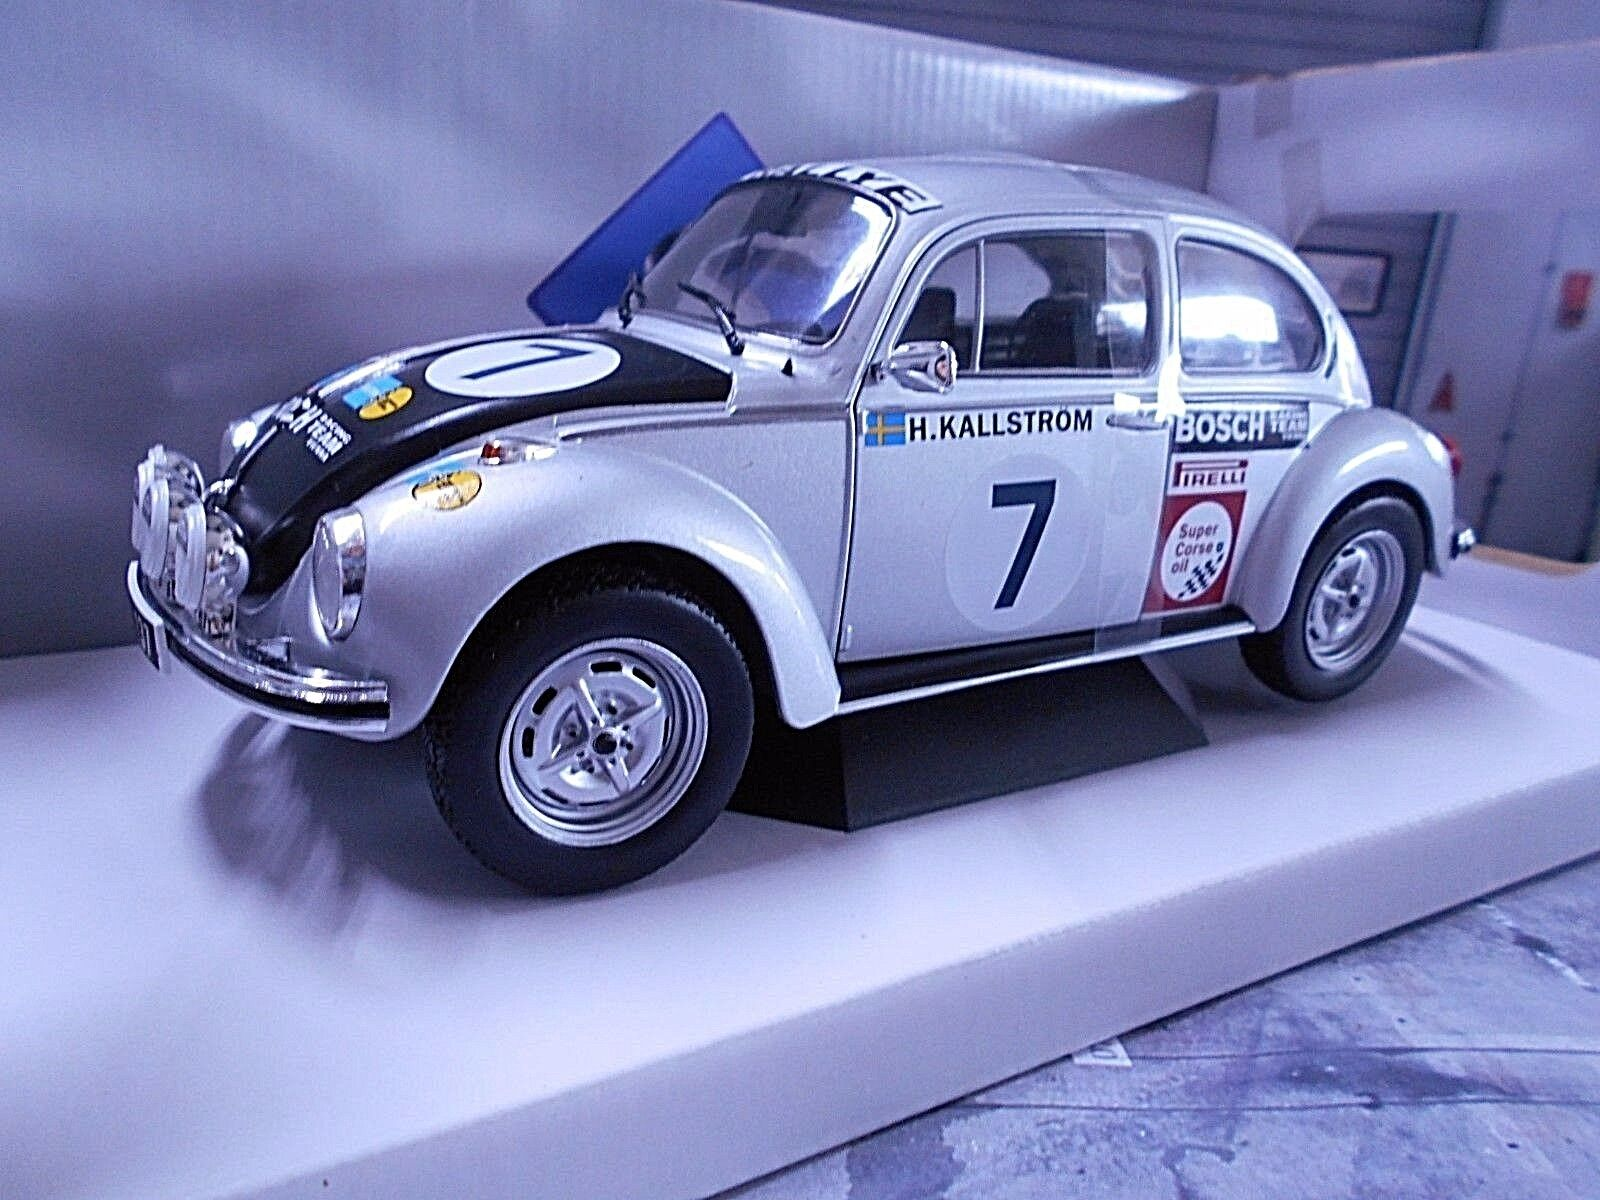 VW Maggiolino Volkswagen Beetle 1303 S RALLY Salzburg Kallström  7 1973 solido 1 18